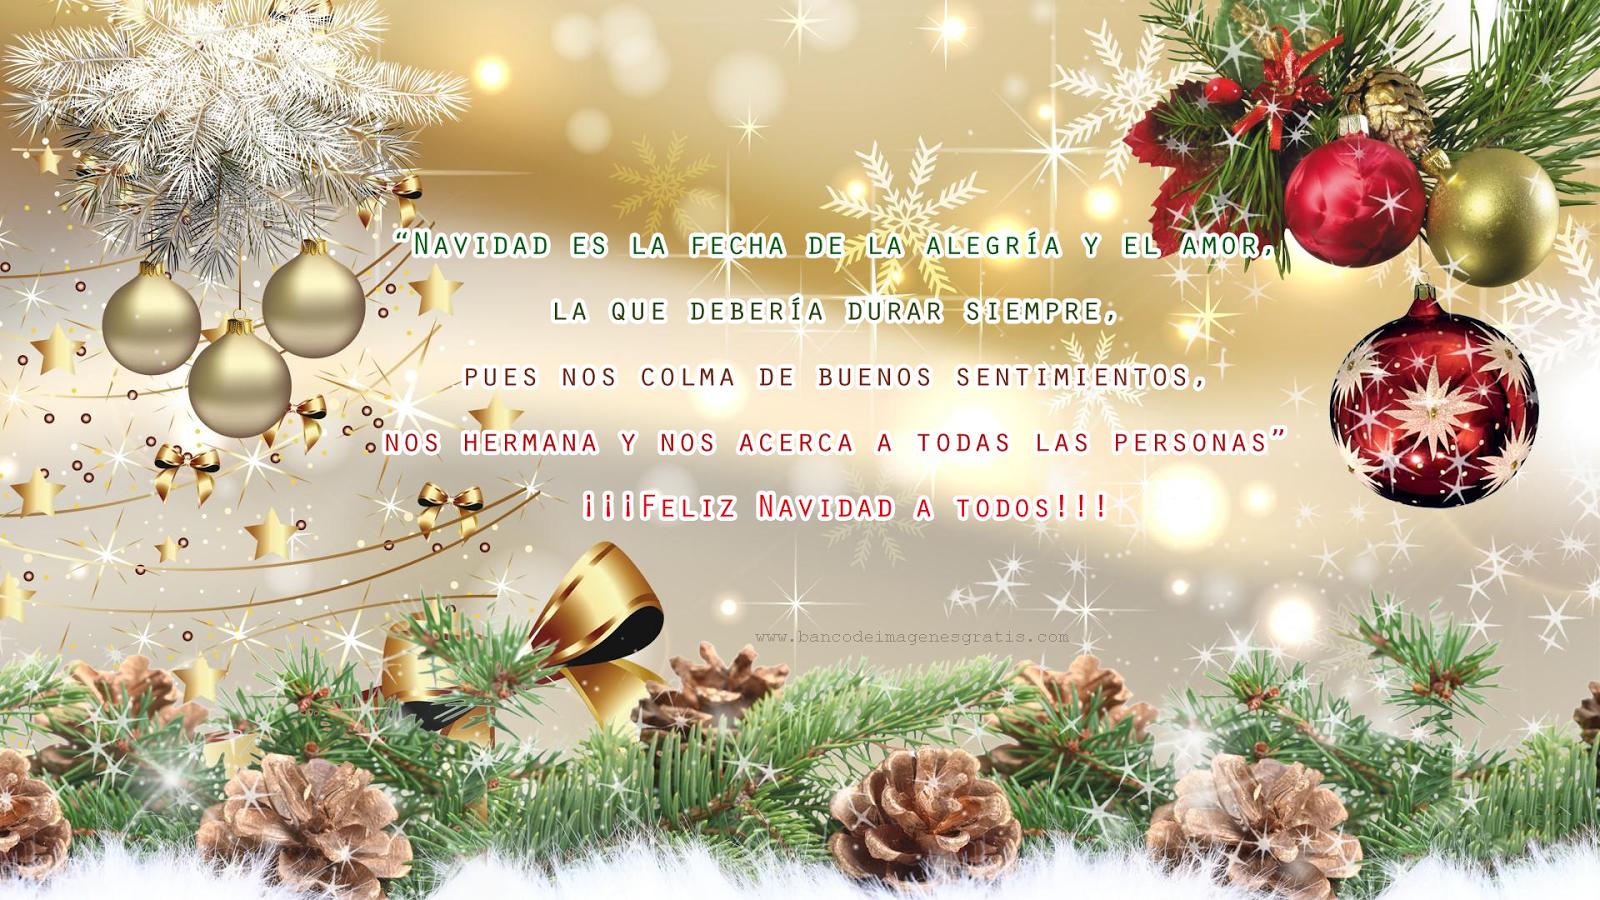 1000 images about frases navide as on pinterest navidad - Postales de navidad bonitas ...